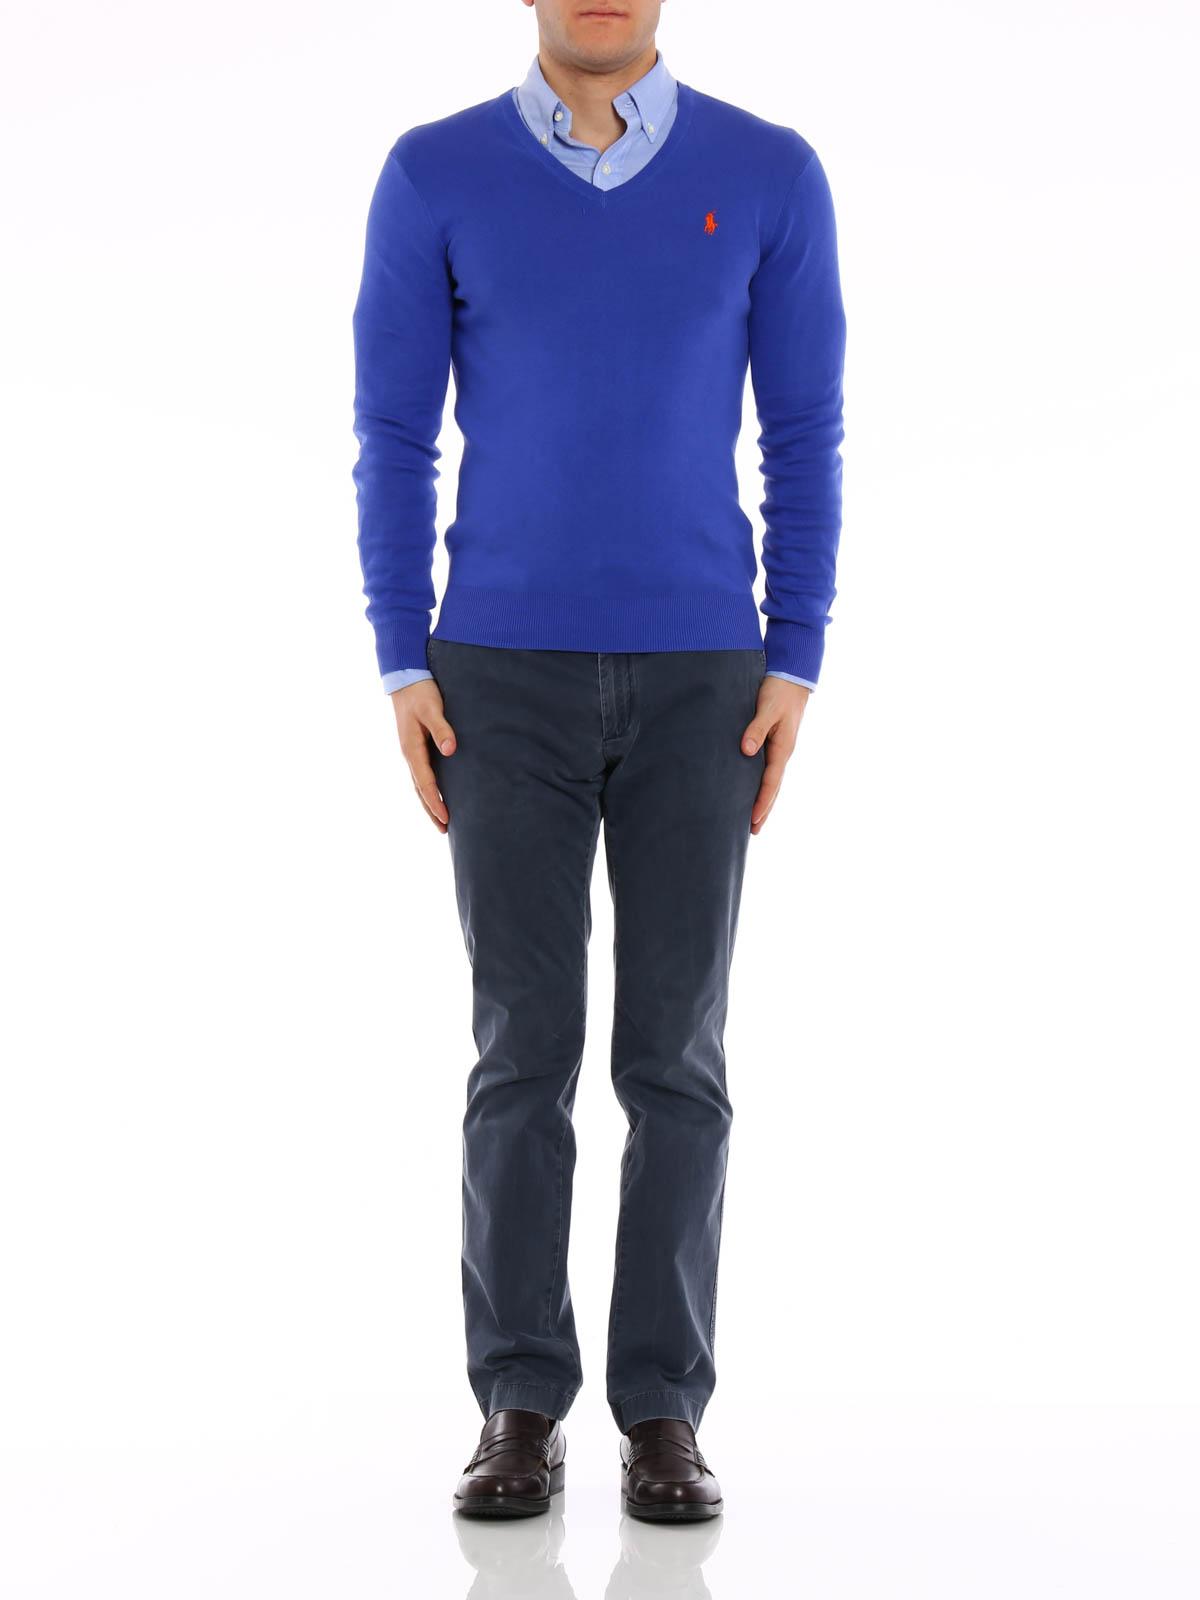 9a53010a3 POLO RALPH LAUREN  v necks online - Cotton slim fit pullover